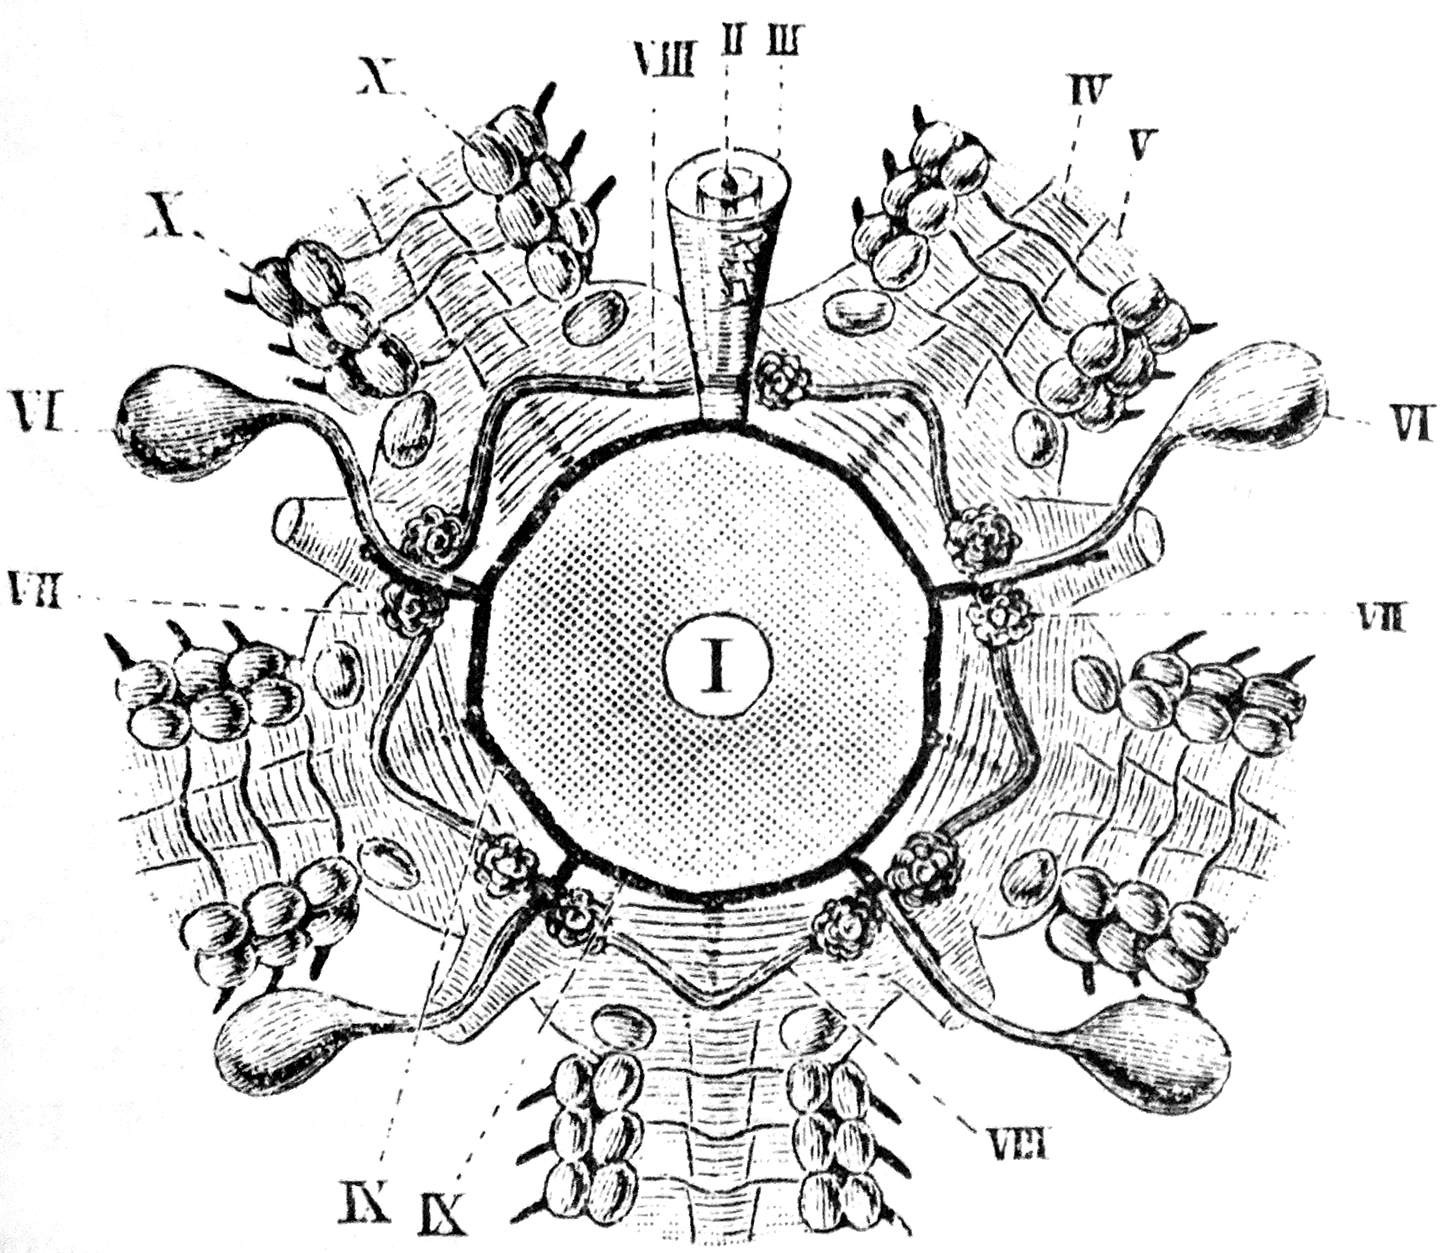 File:Part of starfish water vascular system.jpg - Wikimedia Commons